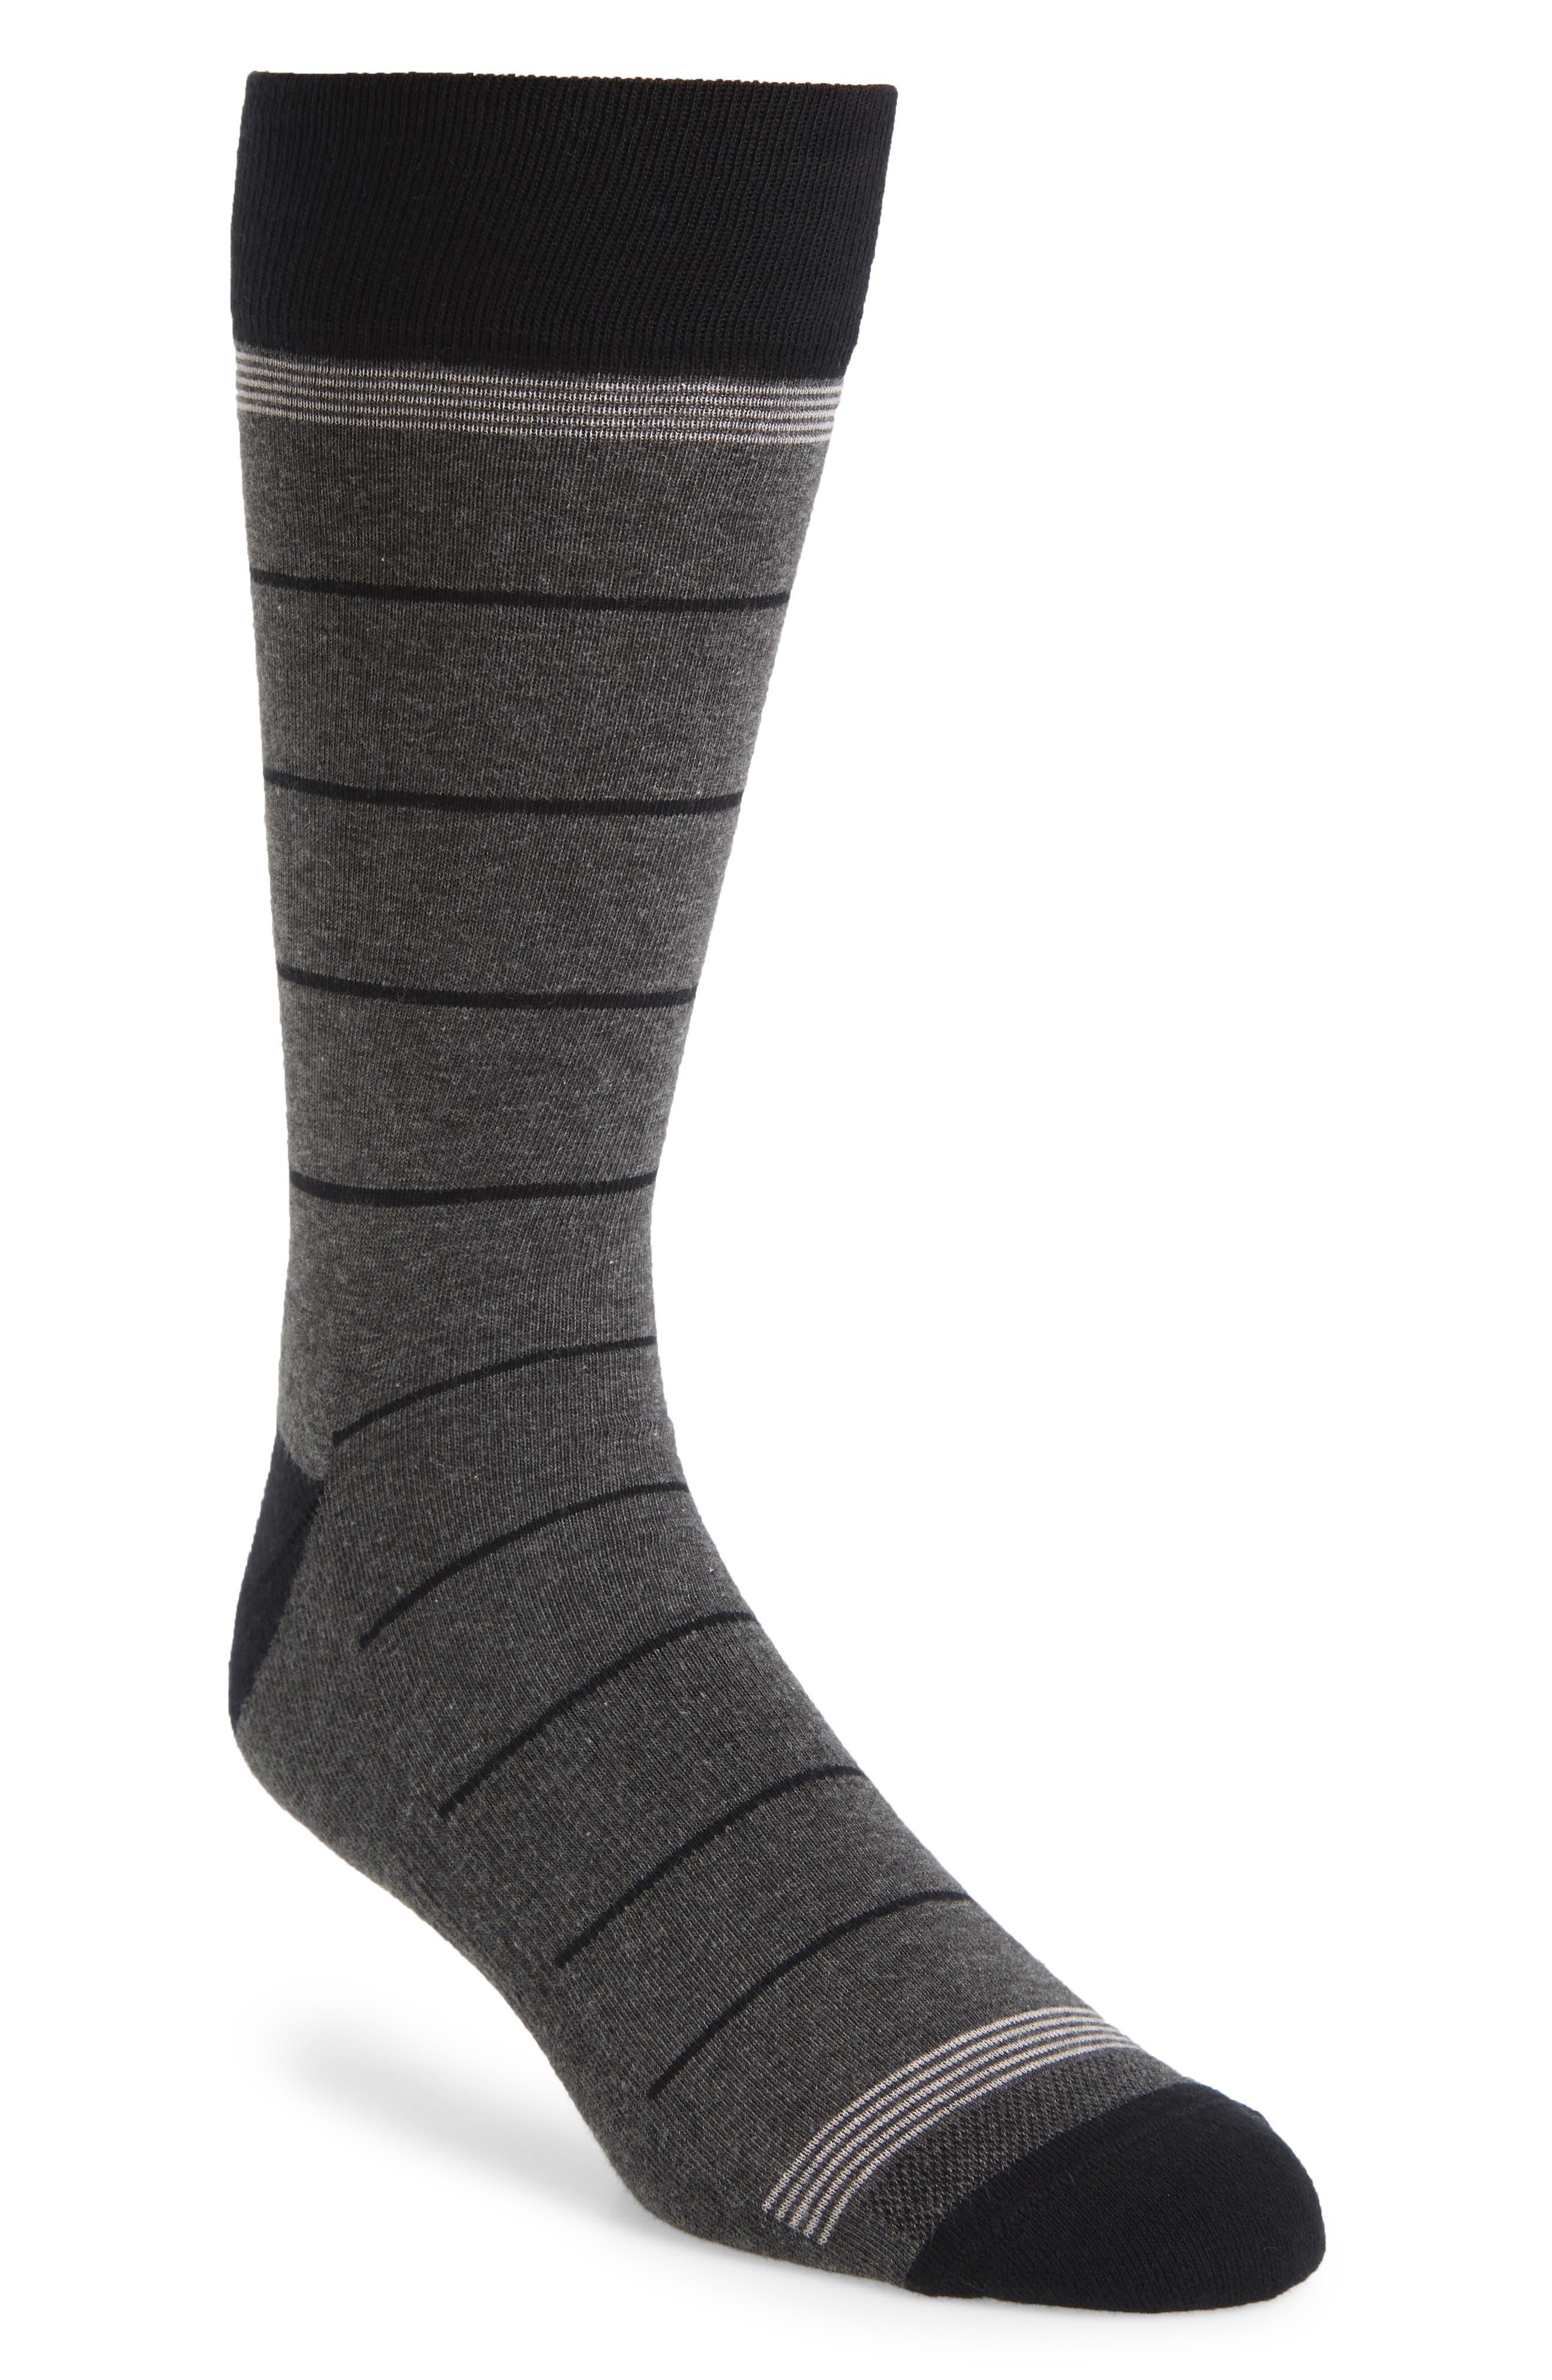 NORDSTROM MEN'S SHOP, Stripe Socks, Main thumbnail 1, color, CHARCOAL/ BLACK